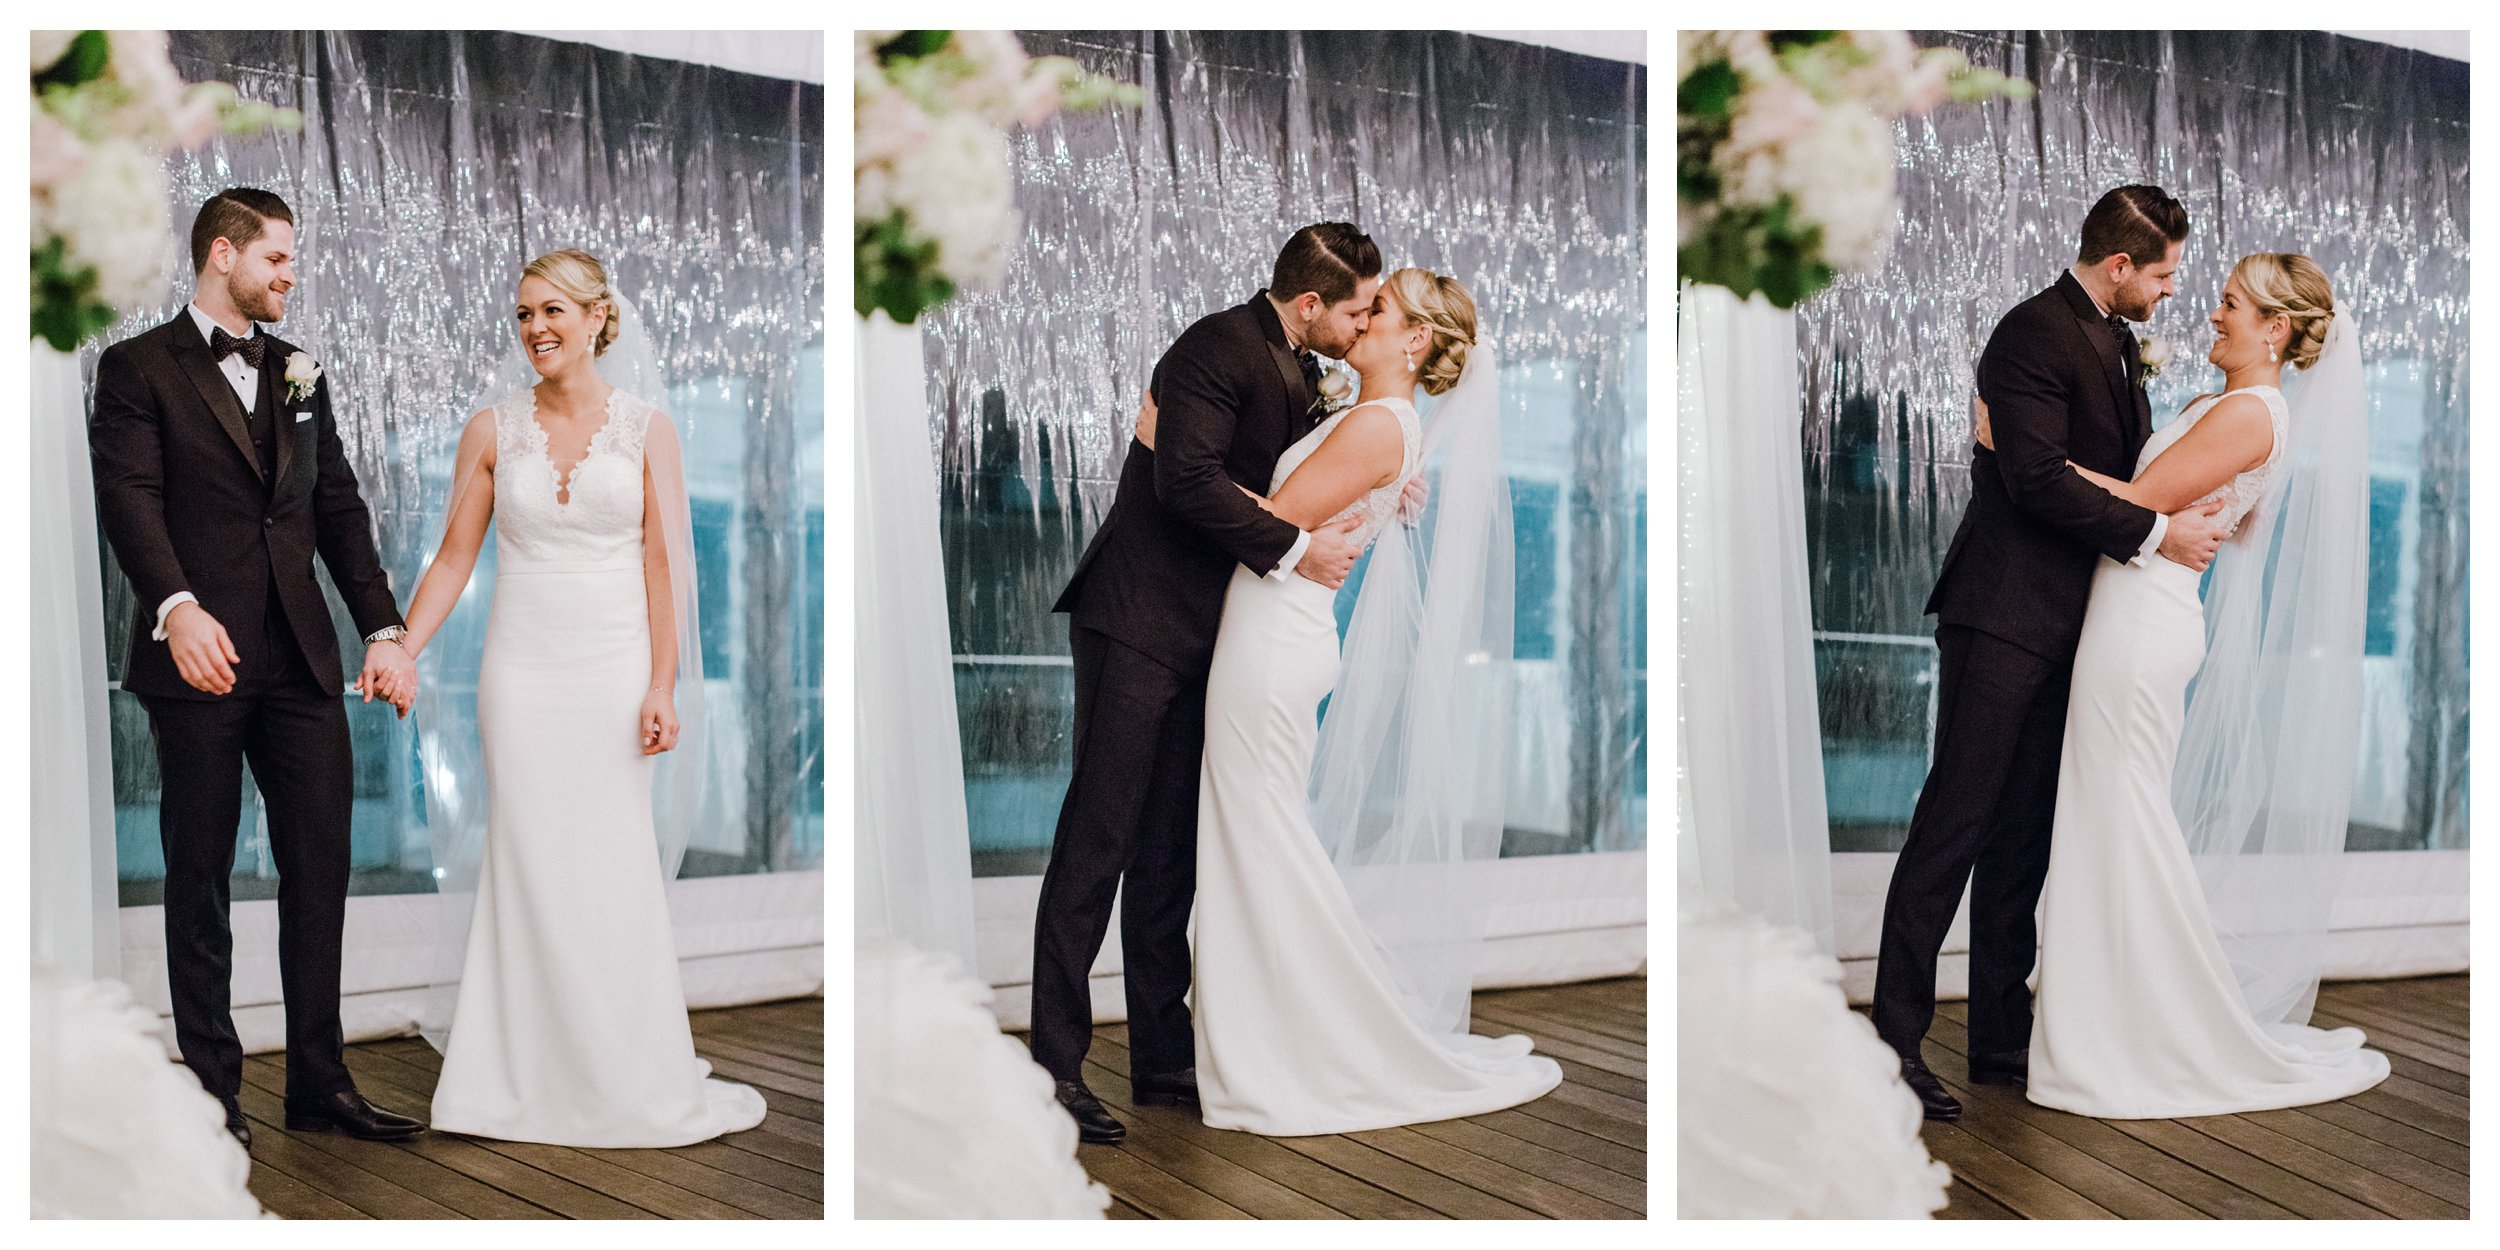 washington-dc-wedding-photographer-43.JPG